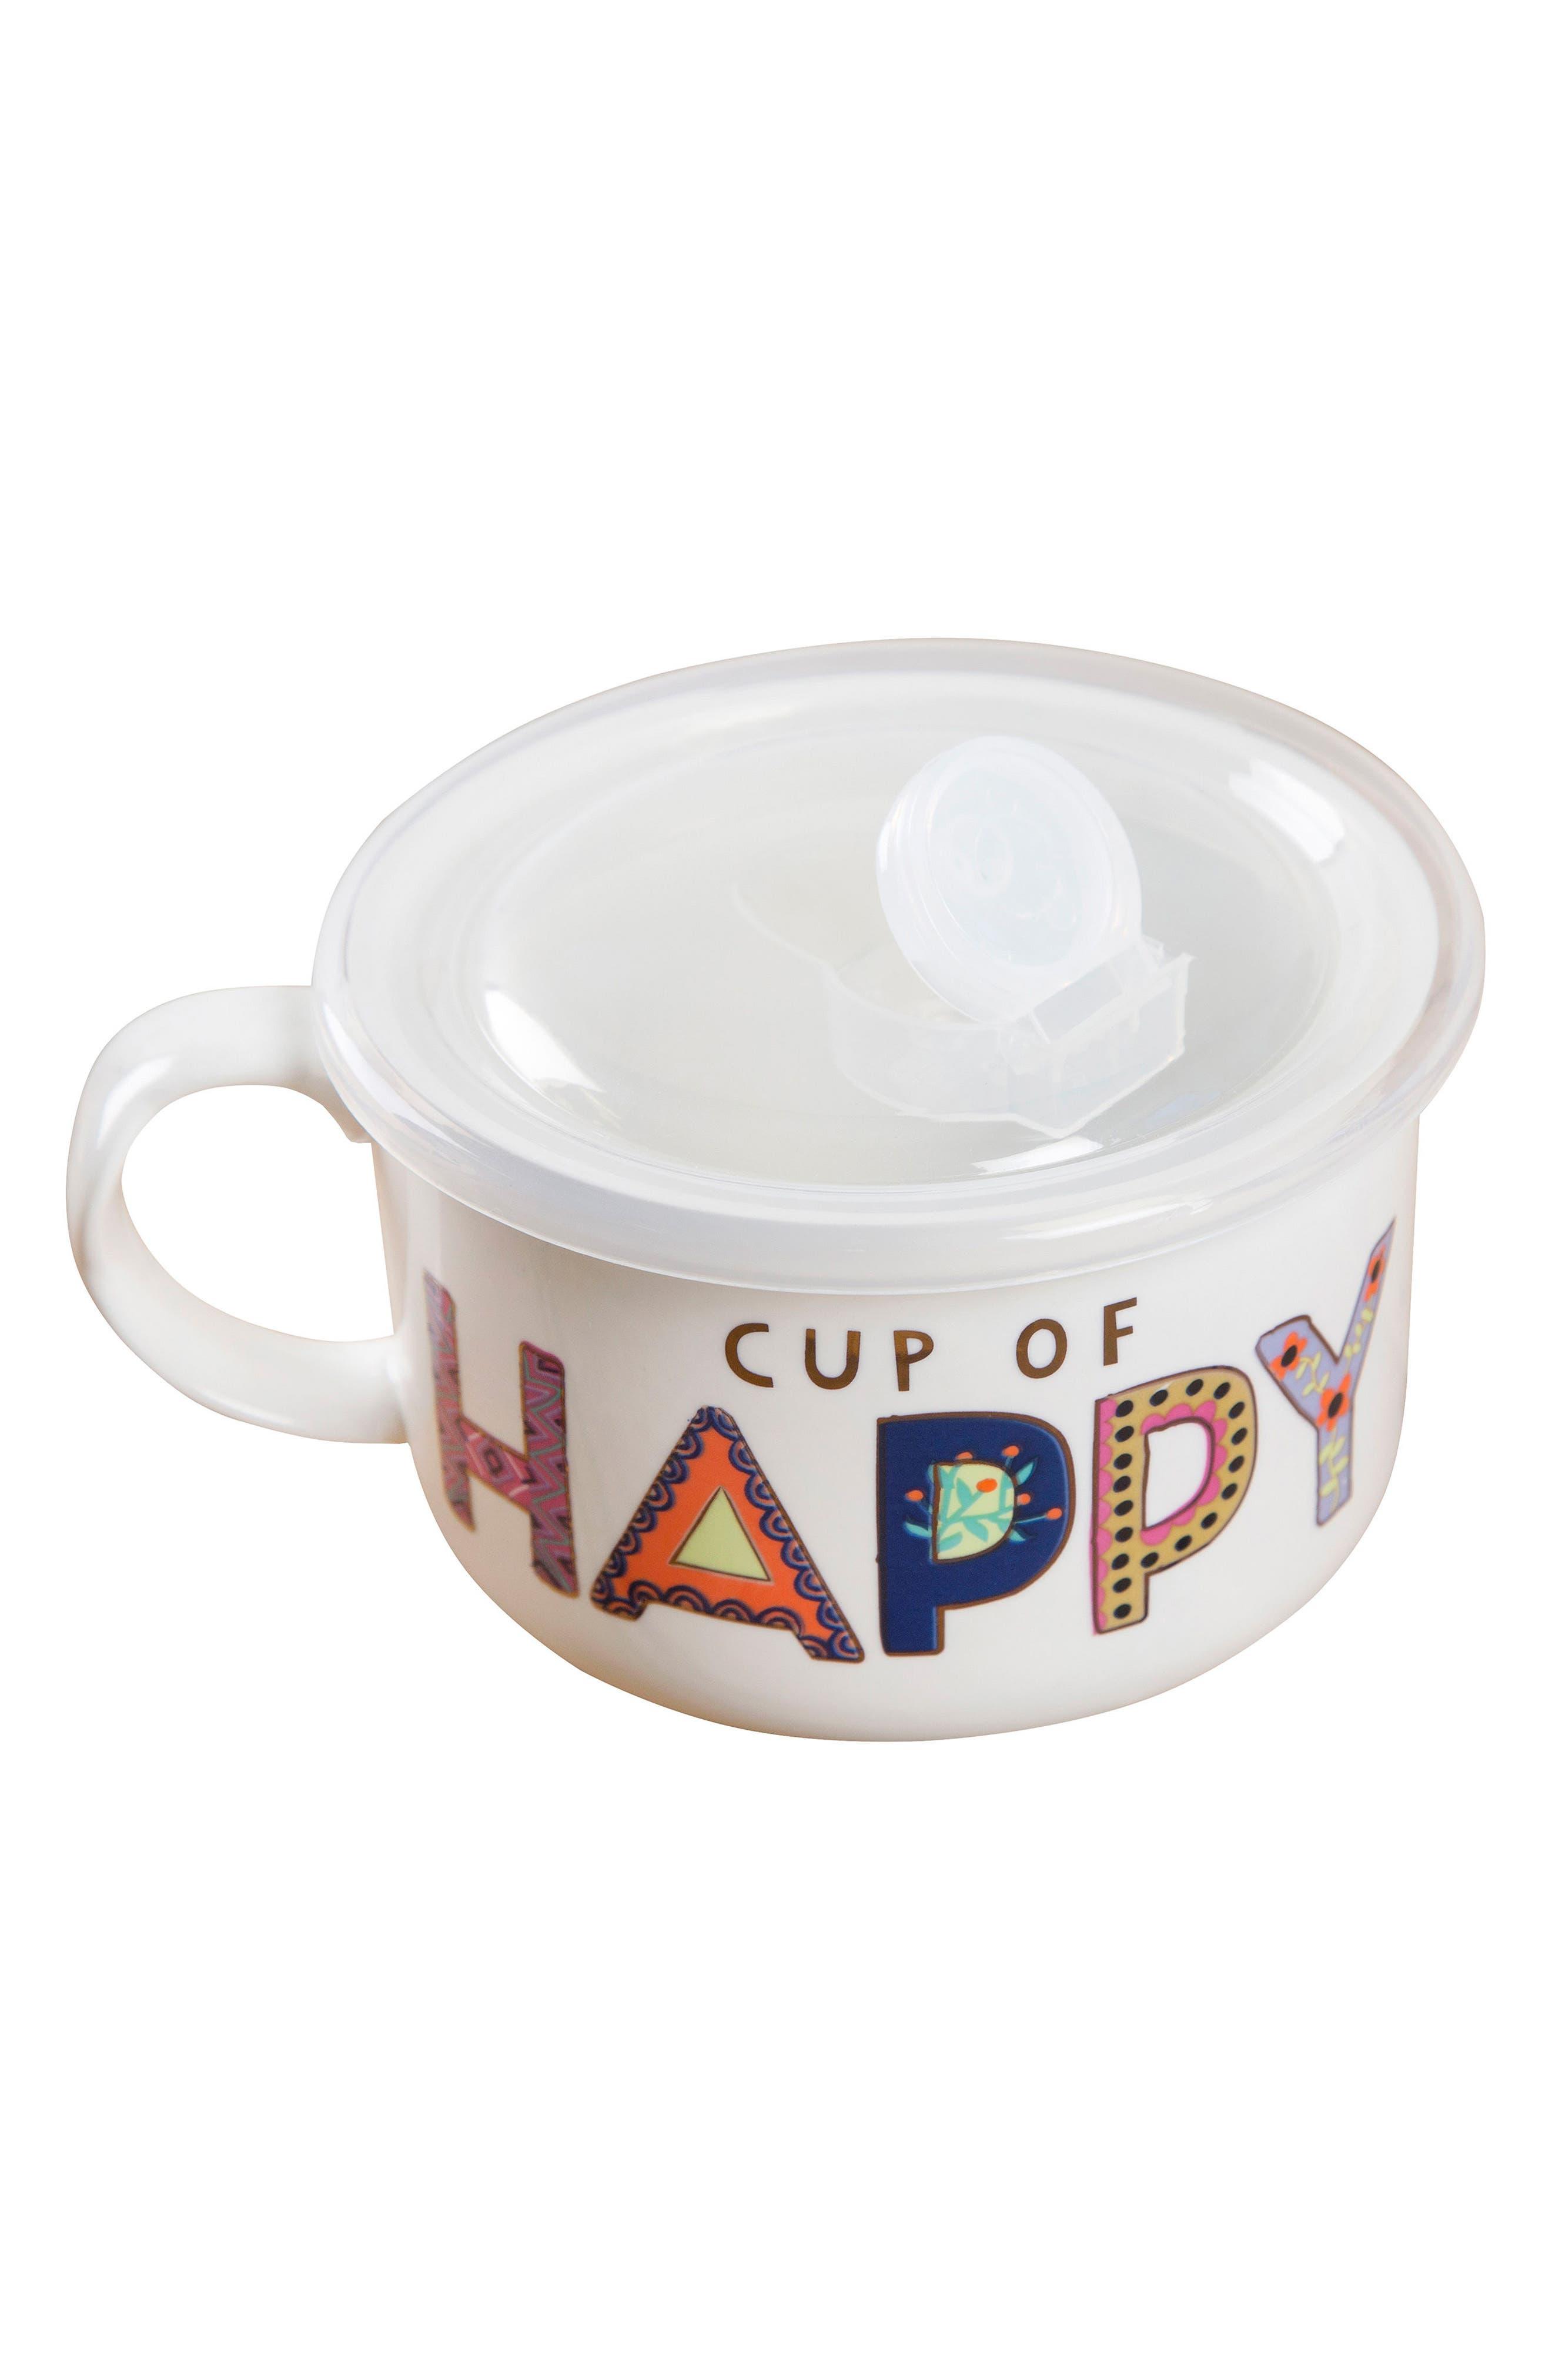 Cup of Happy Lidded Ceramic Soup Mug,                         Main,                         color, 906